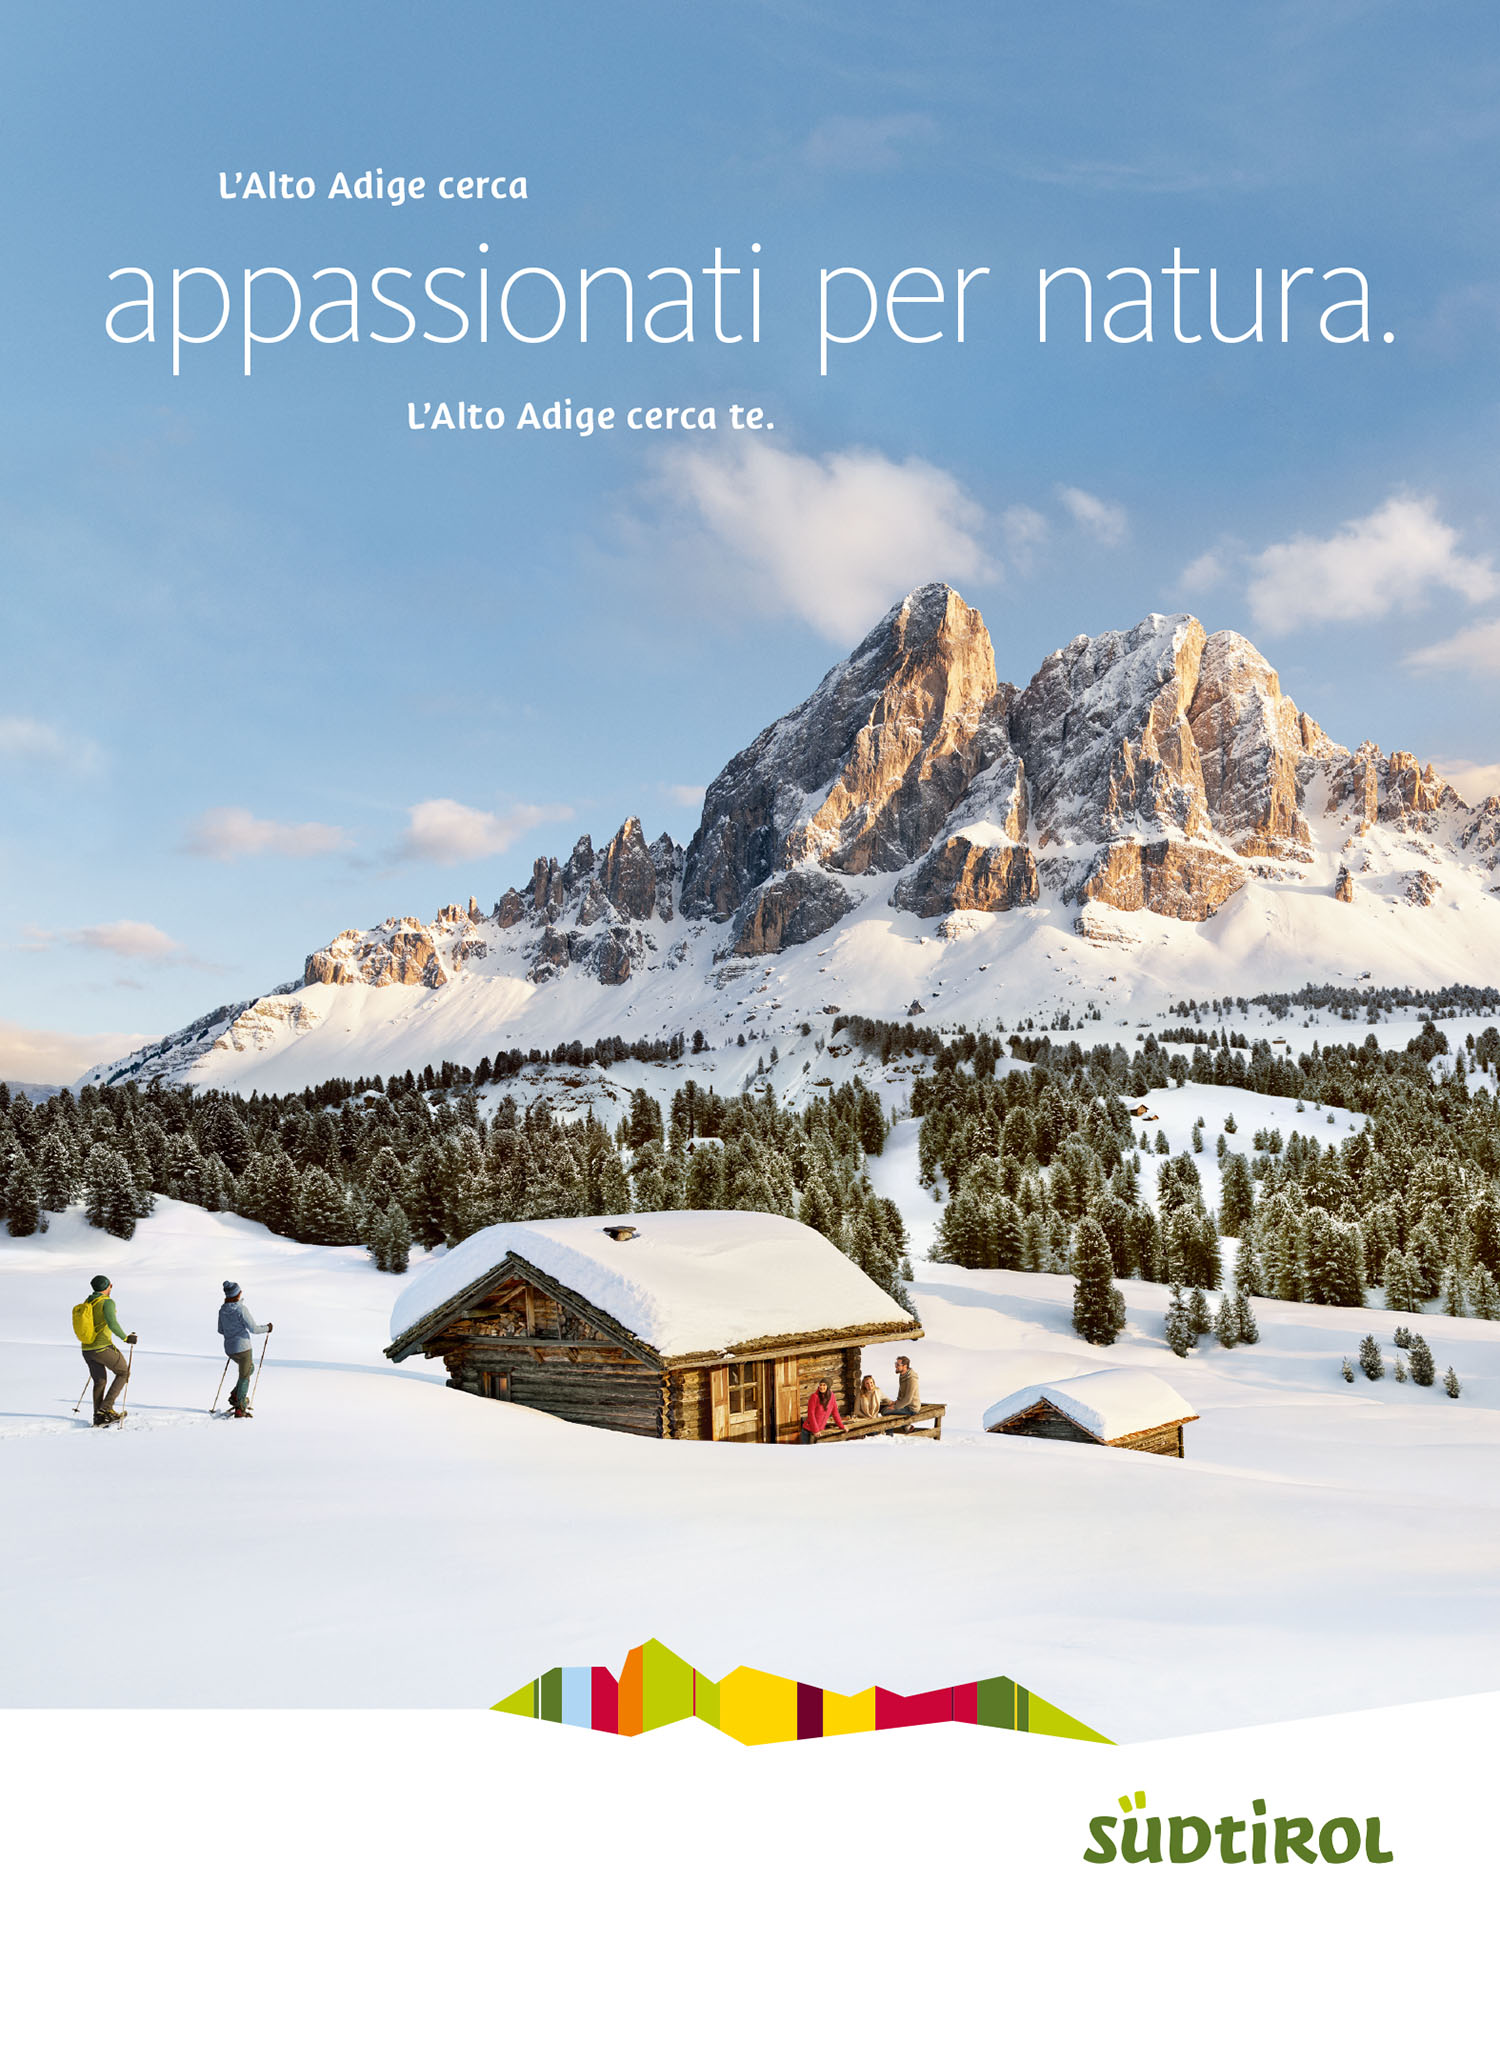 Mierswa-Kluska - South Tirol Campaign